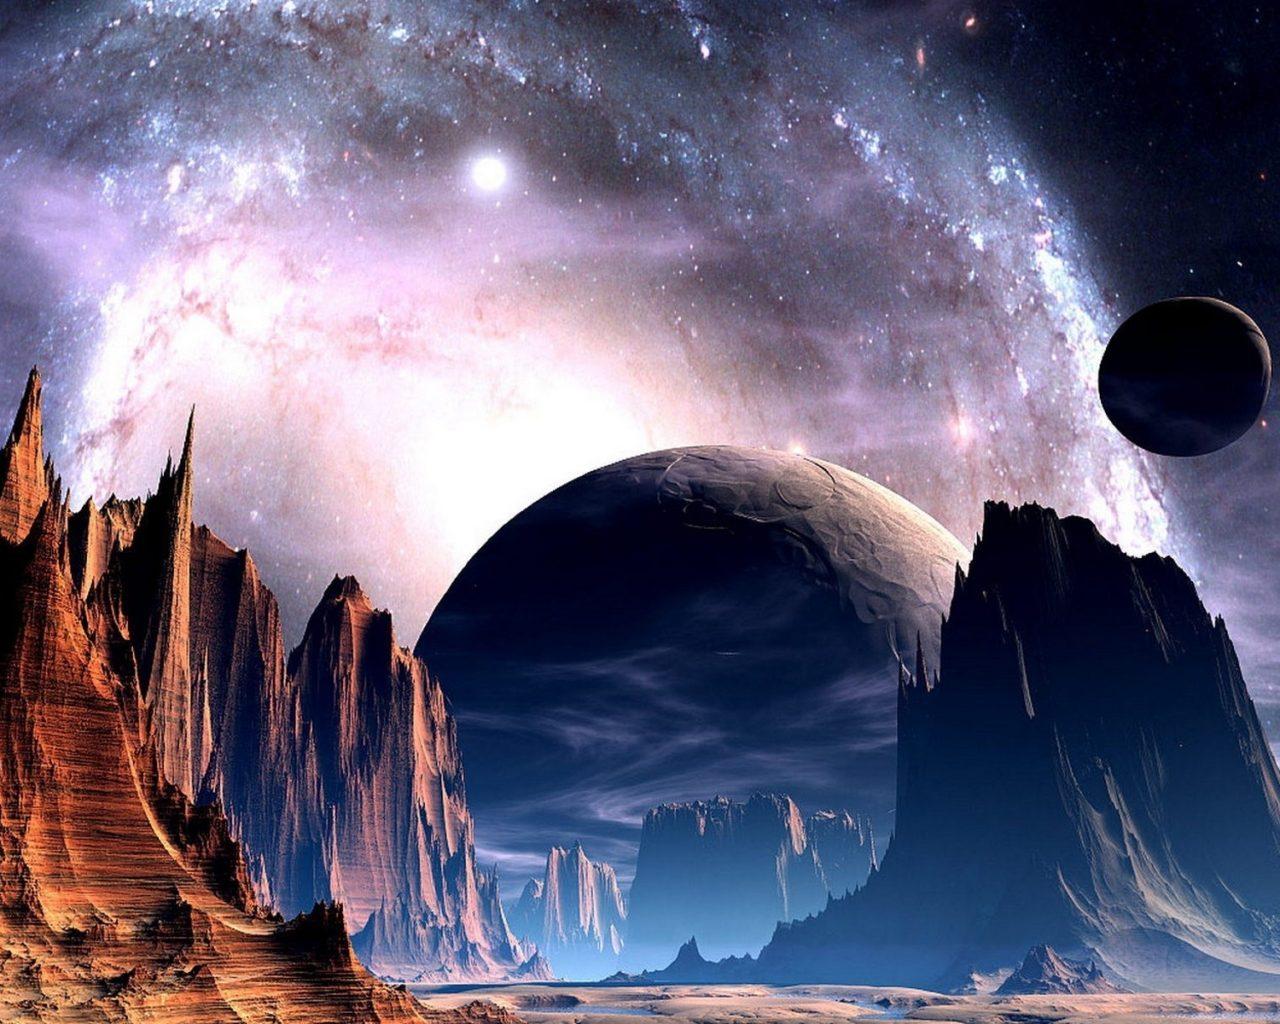 Astronaut Wallpaper Iphone X Sci Fi Science Fiction Planets Alien Sky Stars Nebula